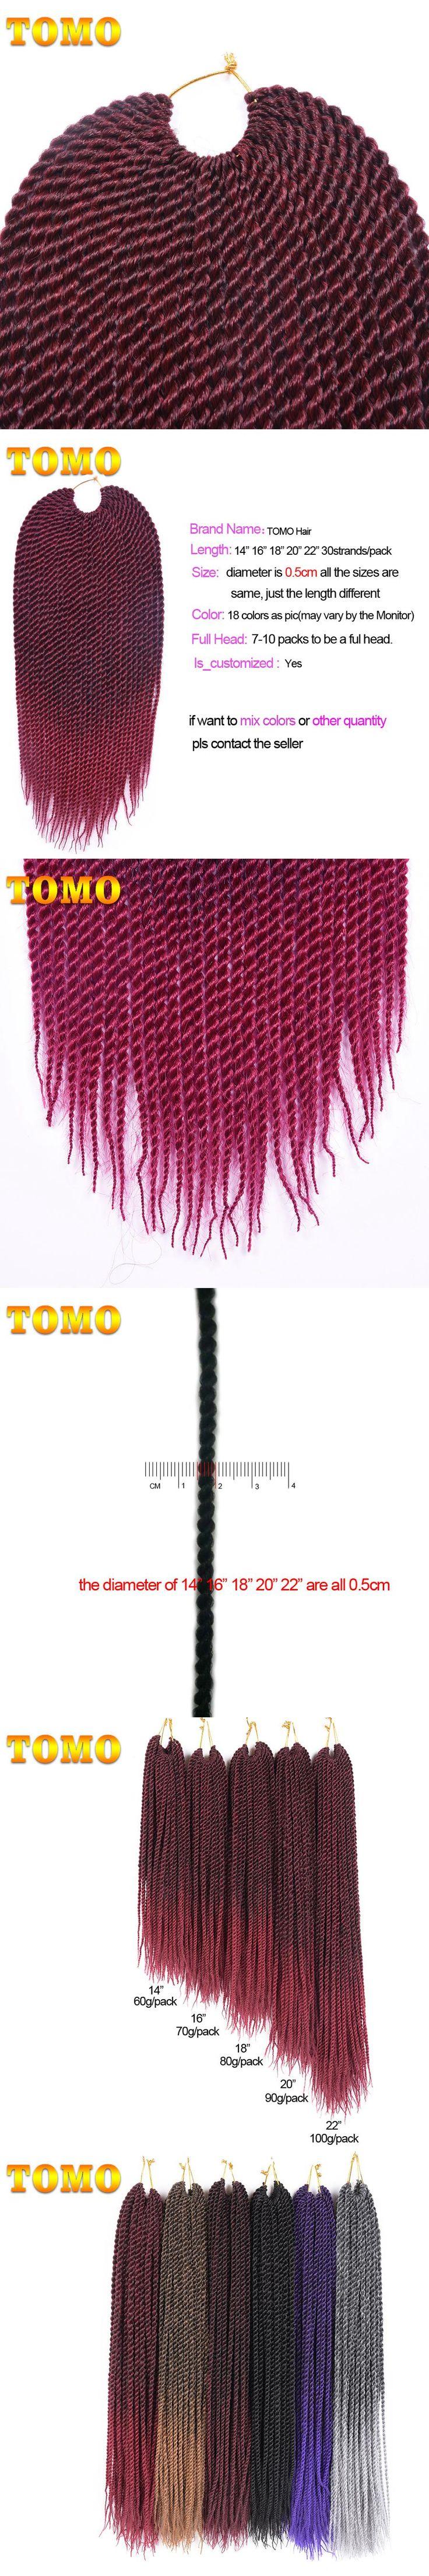 "TOMO 14"" 16"" 18"" 20"" 22"" 30strands Synthetic Senegalese Twist Crochet Hair Extensions Ombre Kanekalon Havana Twist Crochet Braid"